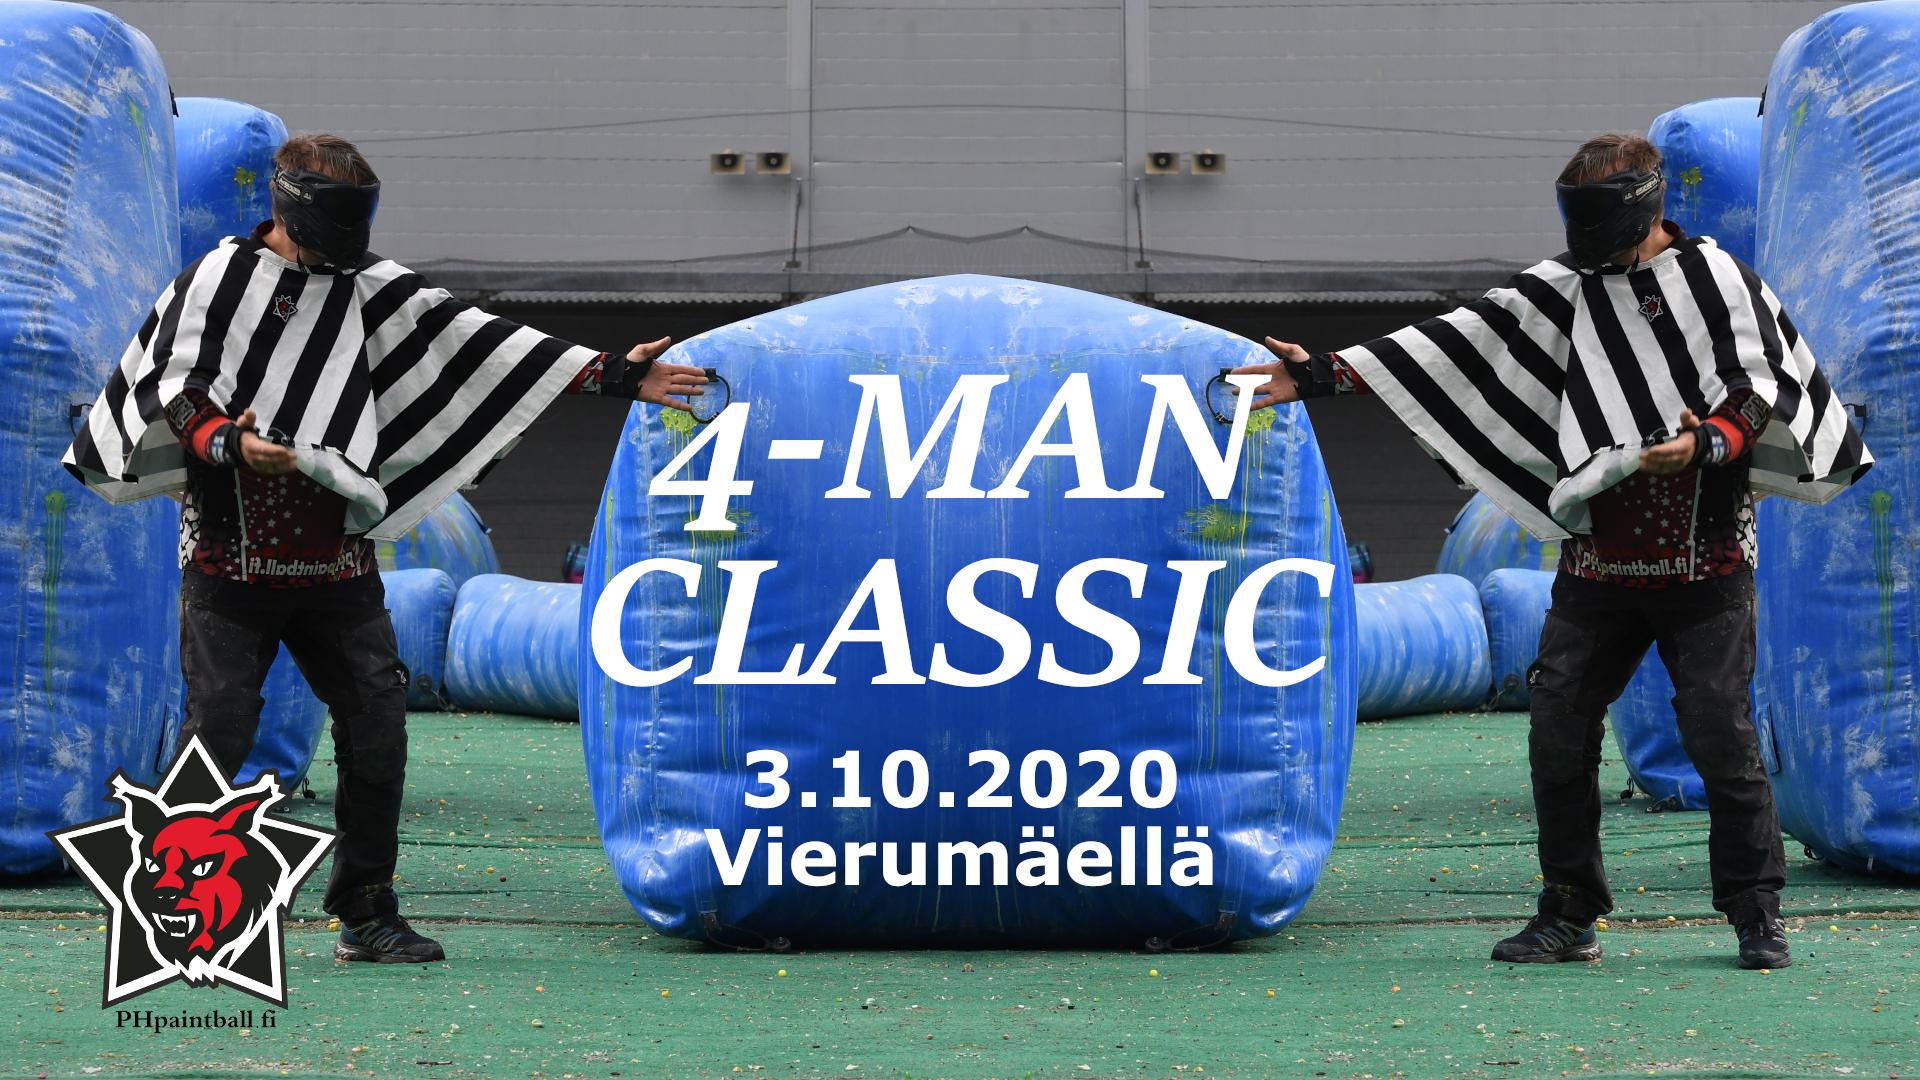 4man_classic_2020.jpg